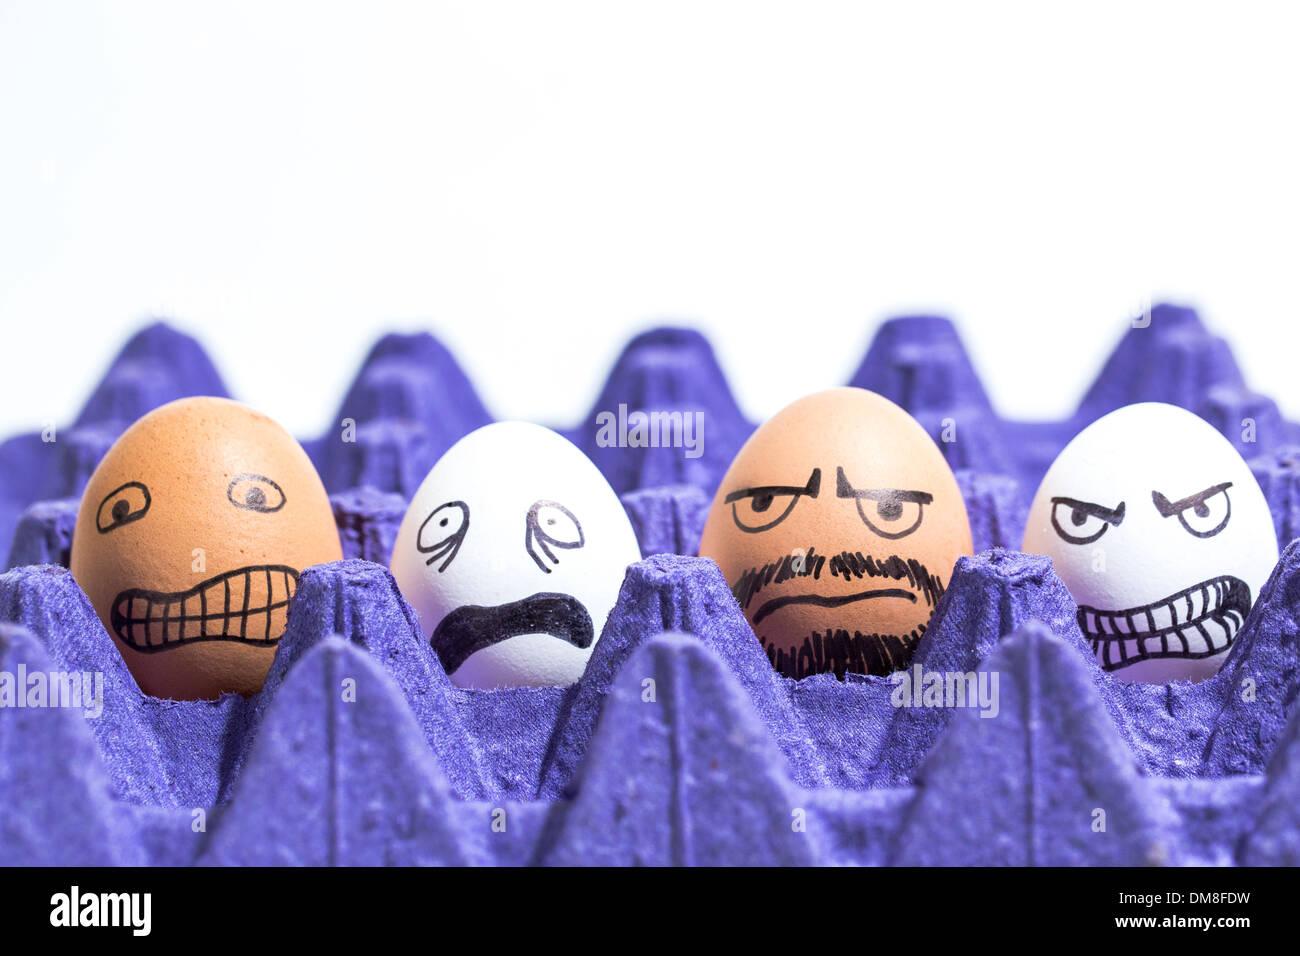 998757bdf4e5 Emotions Faces Stock Photos & Emotions Faces Stock Images - Alamy